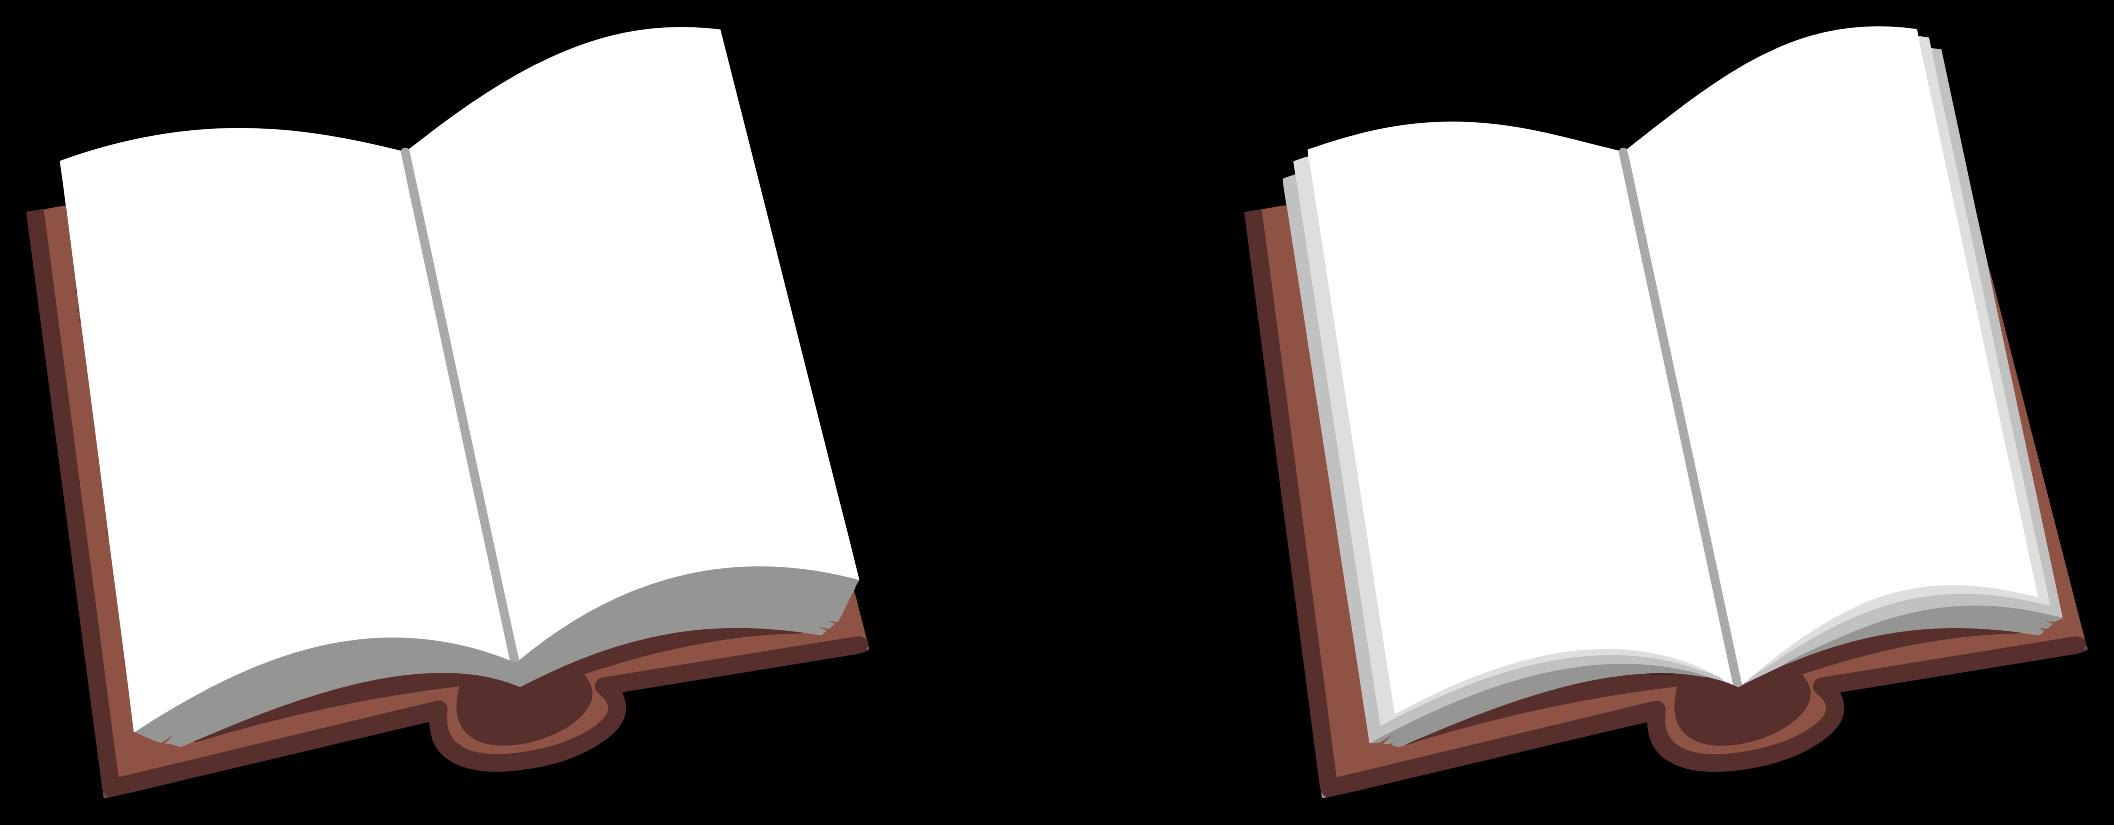 Clipart books big image. Open book clip art school